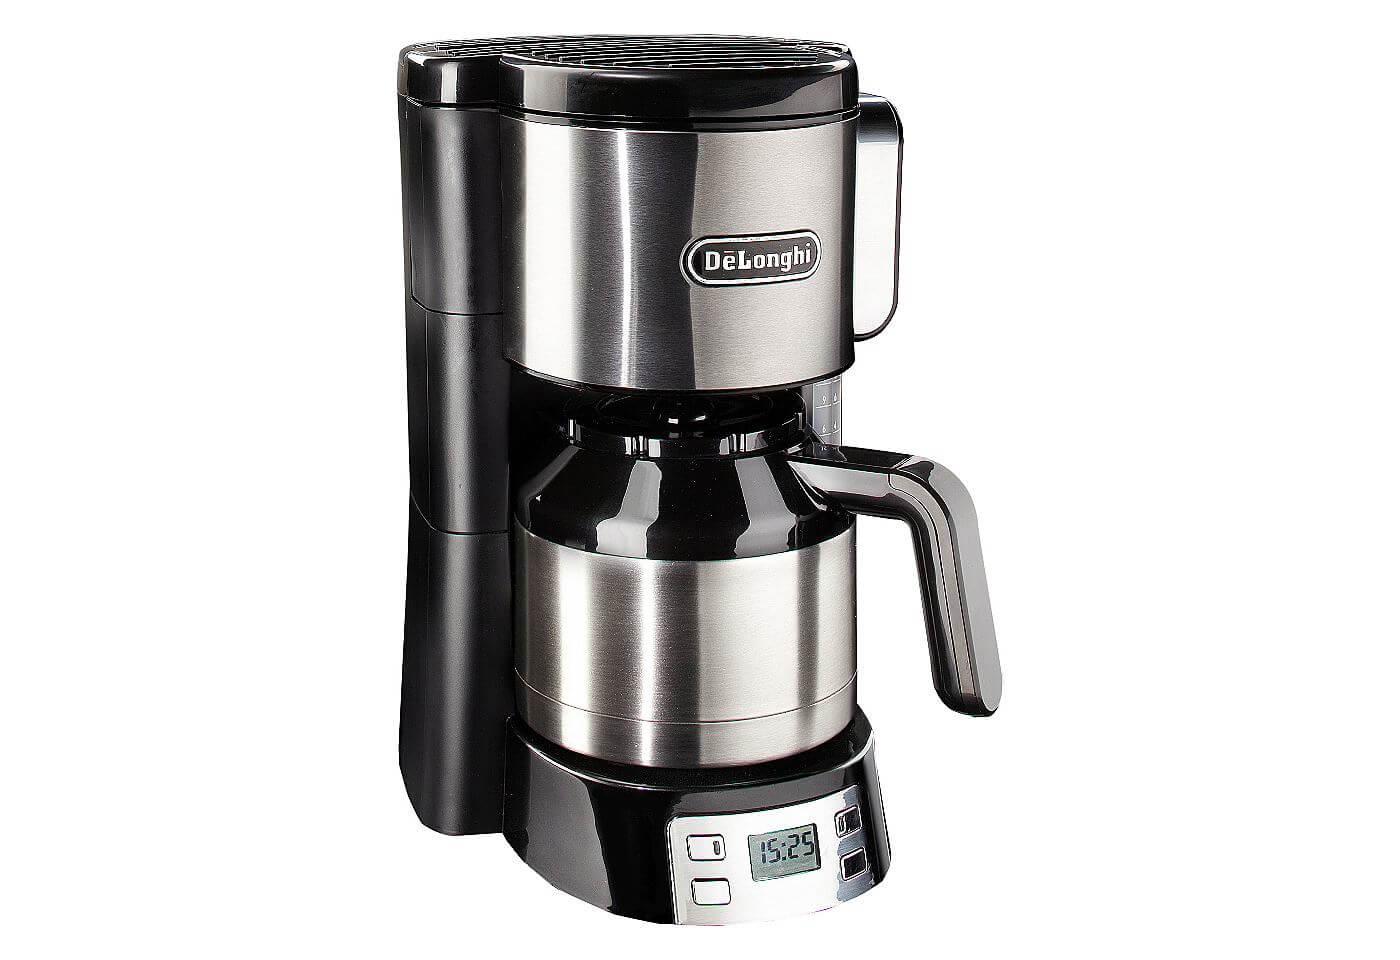 DeLonghi Kaffeemaschine ICM15750